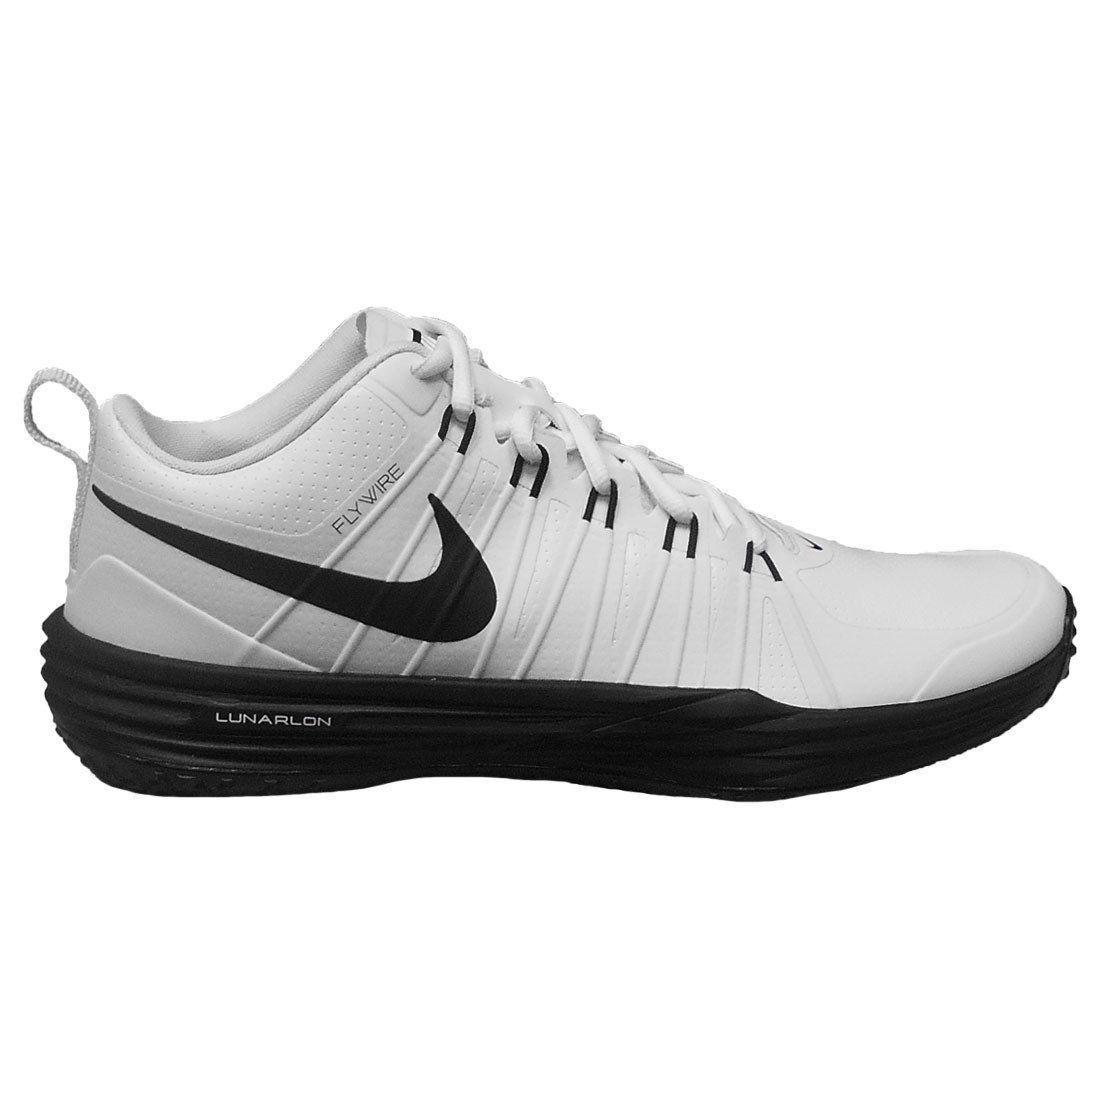 Nike Men's Lunar TR1 SLTR TB Training Shoes